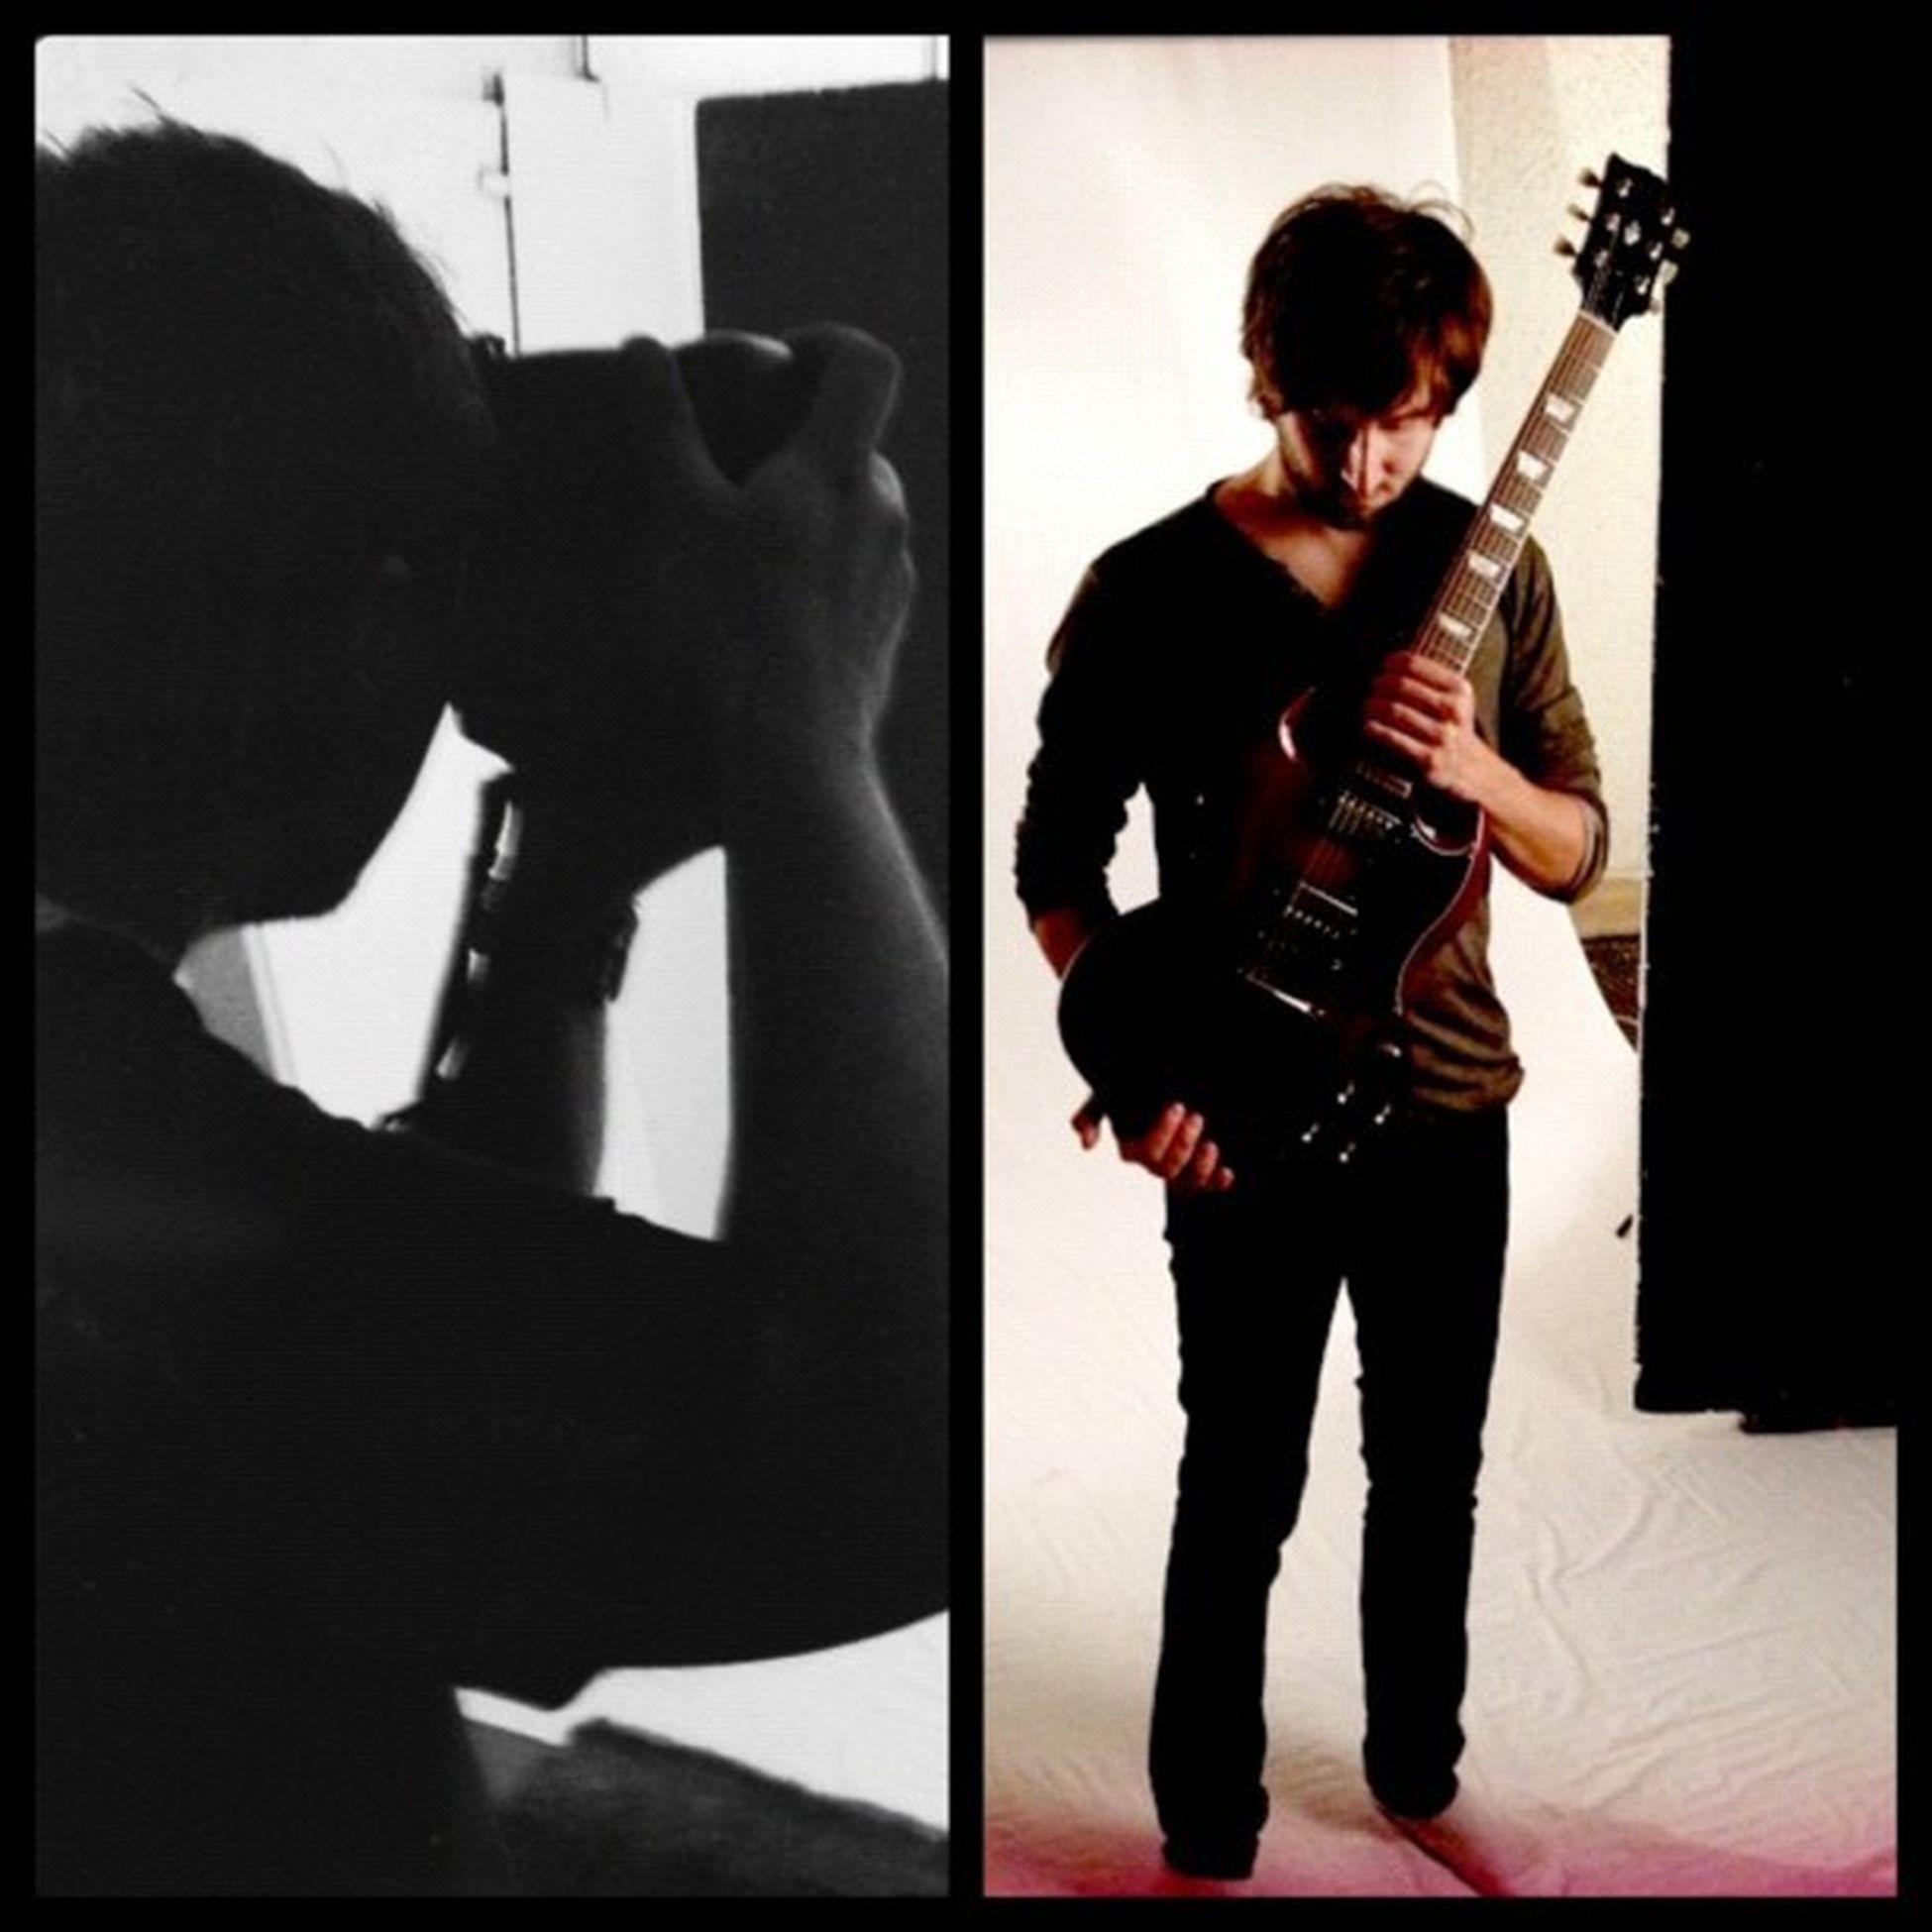 new photos coming soon Vanillasky Neroscurostudio